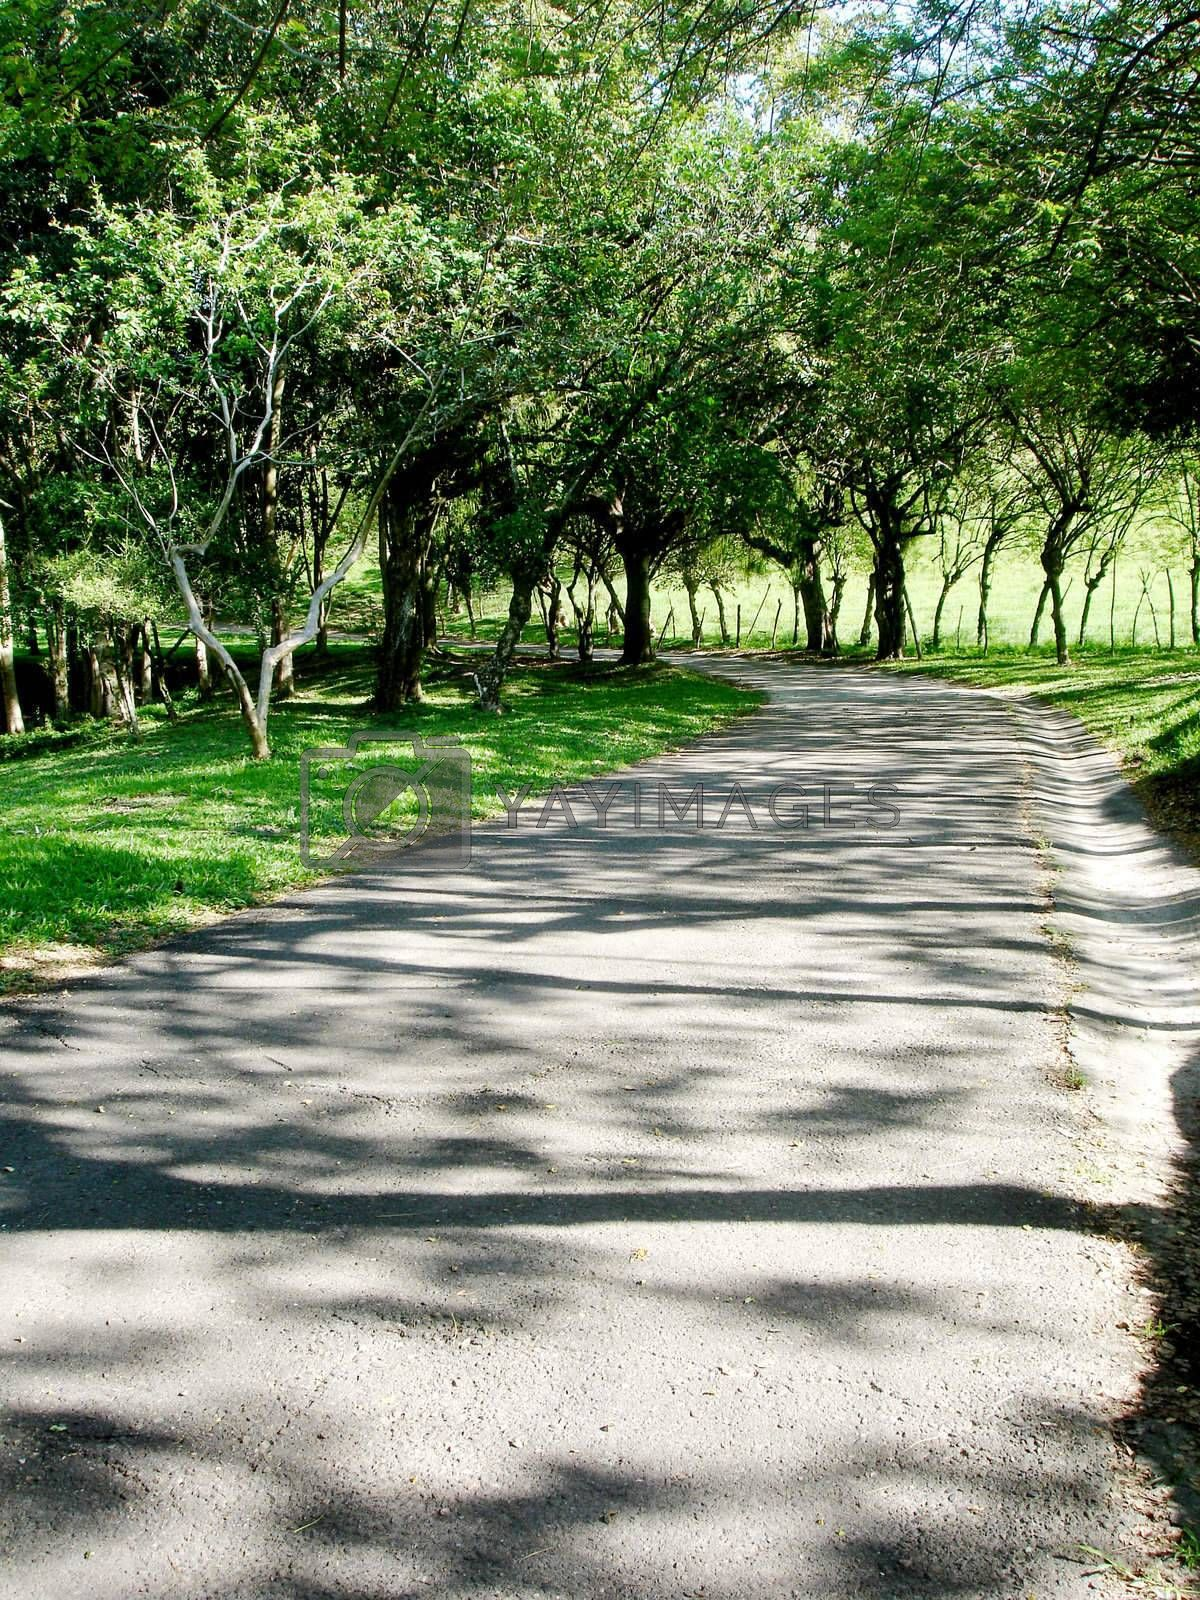 landscape of way whit tree shadows, photo image